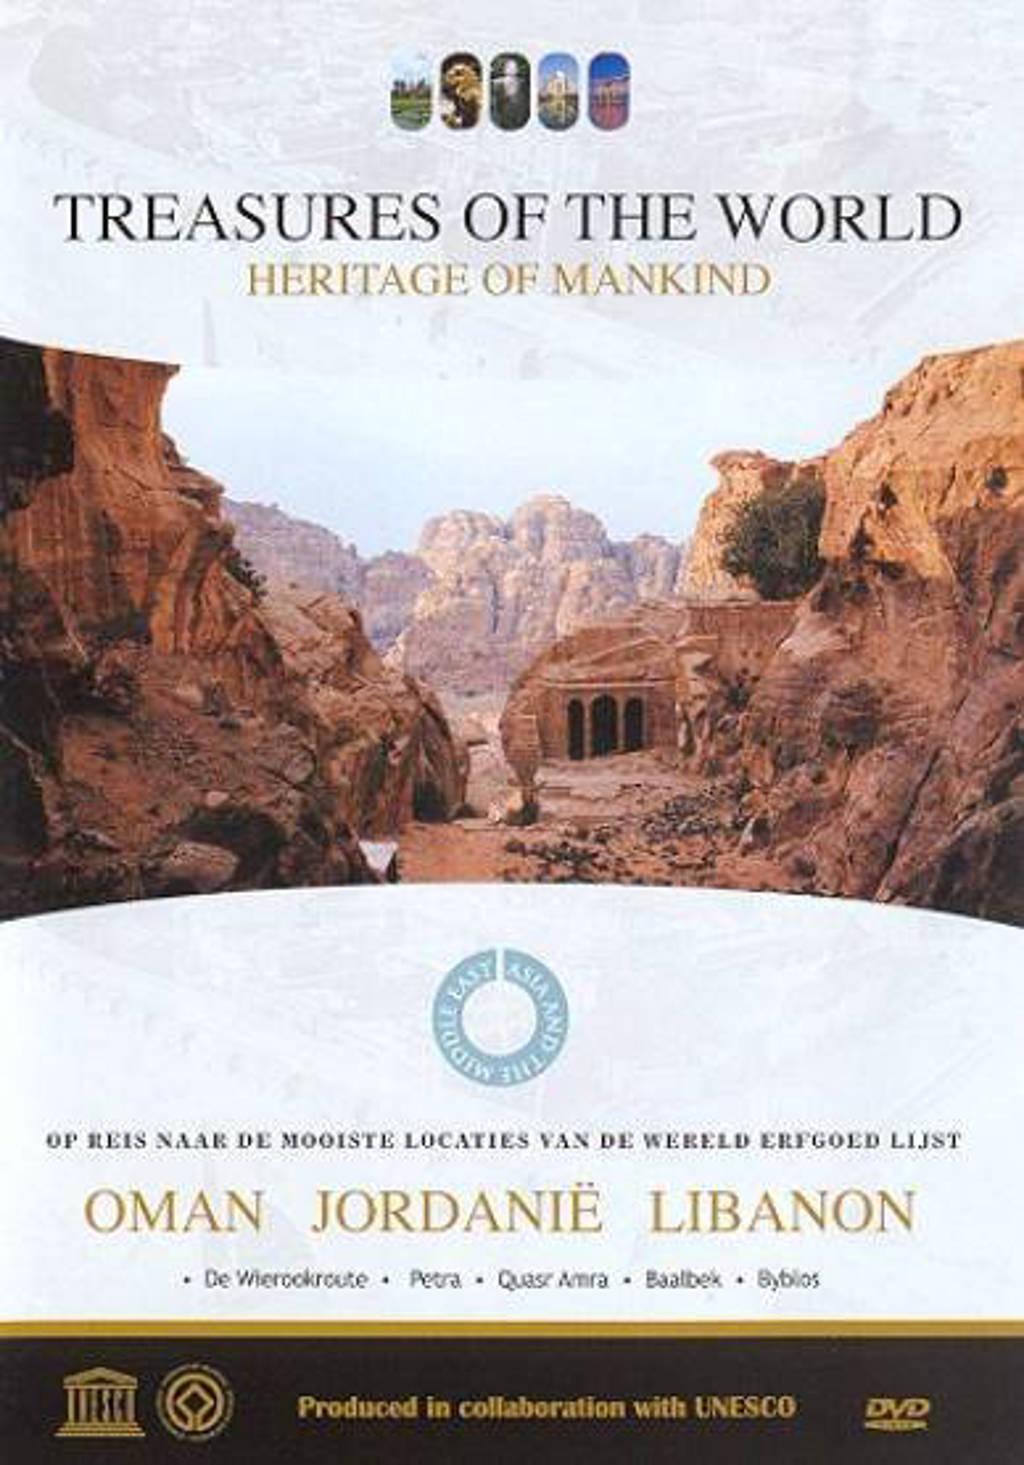 Treasures of the world 7 - Oman (DVD)